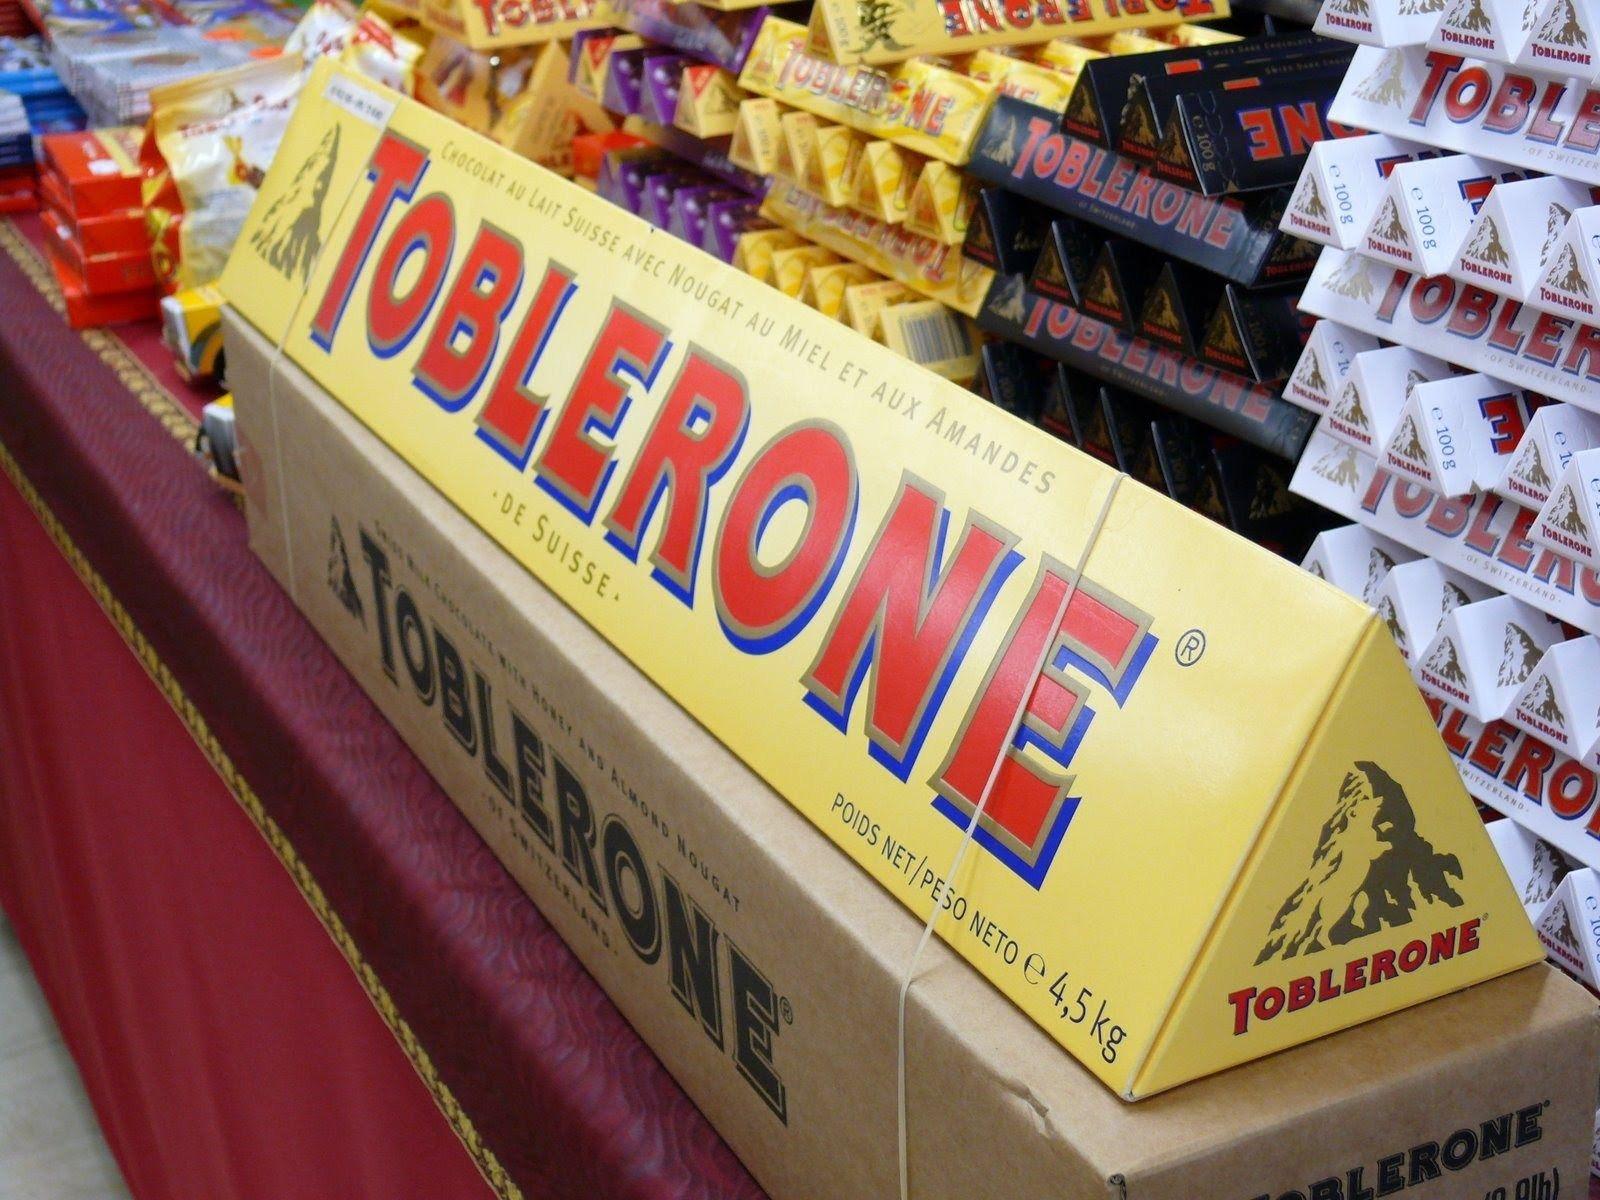 toblerone-jumbo-4-kilo-500-grammes